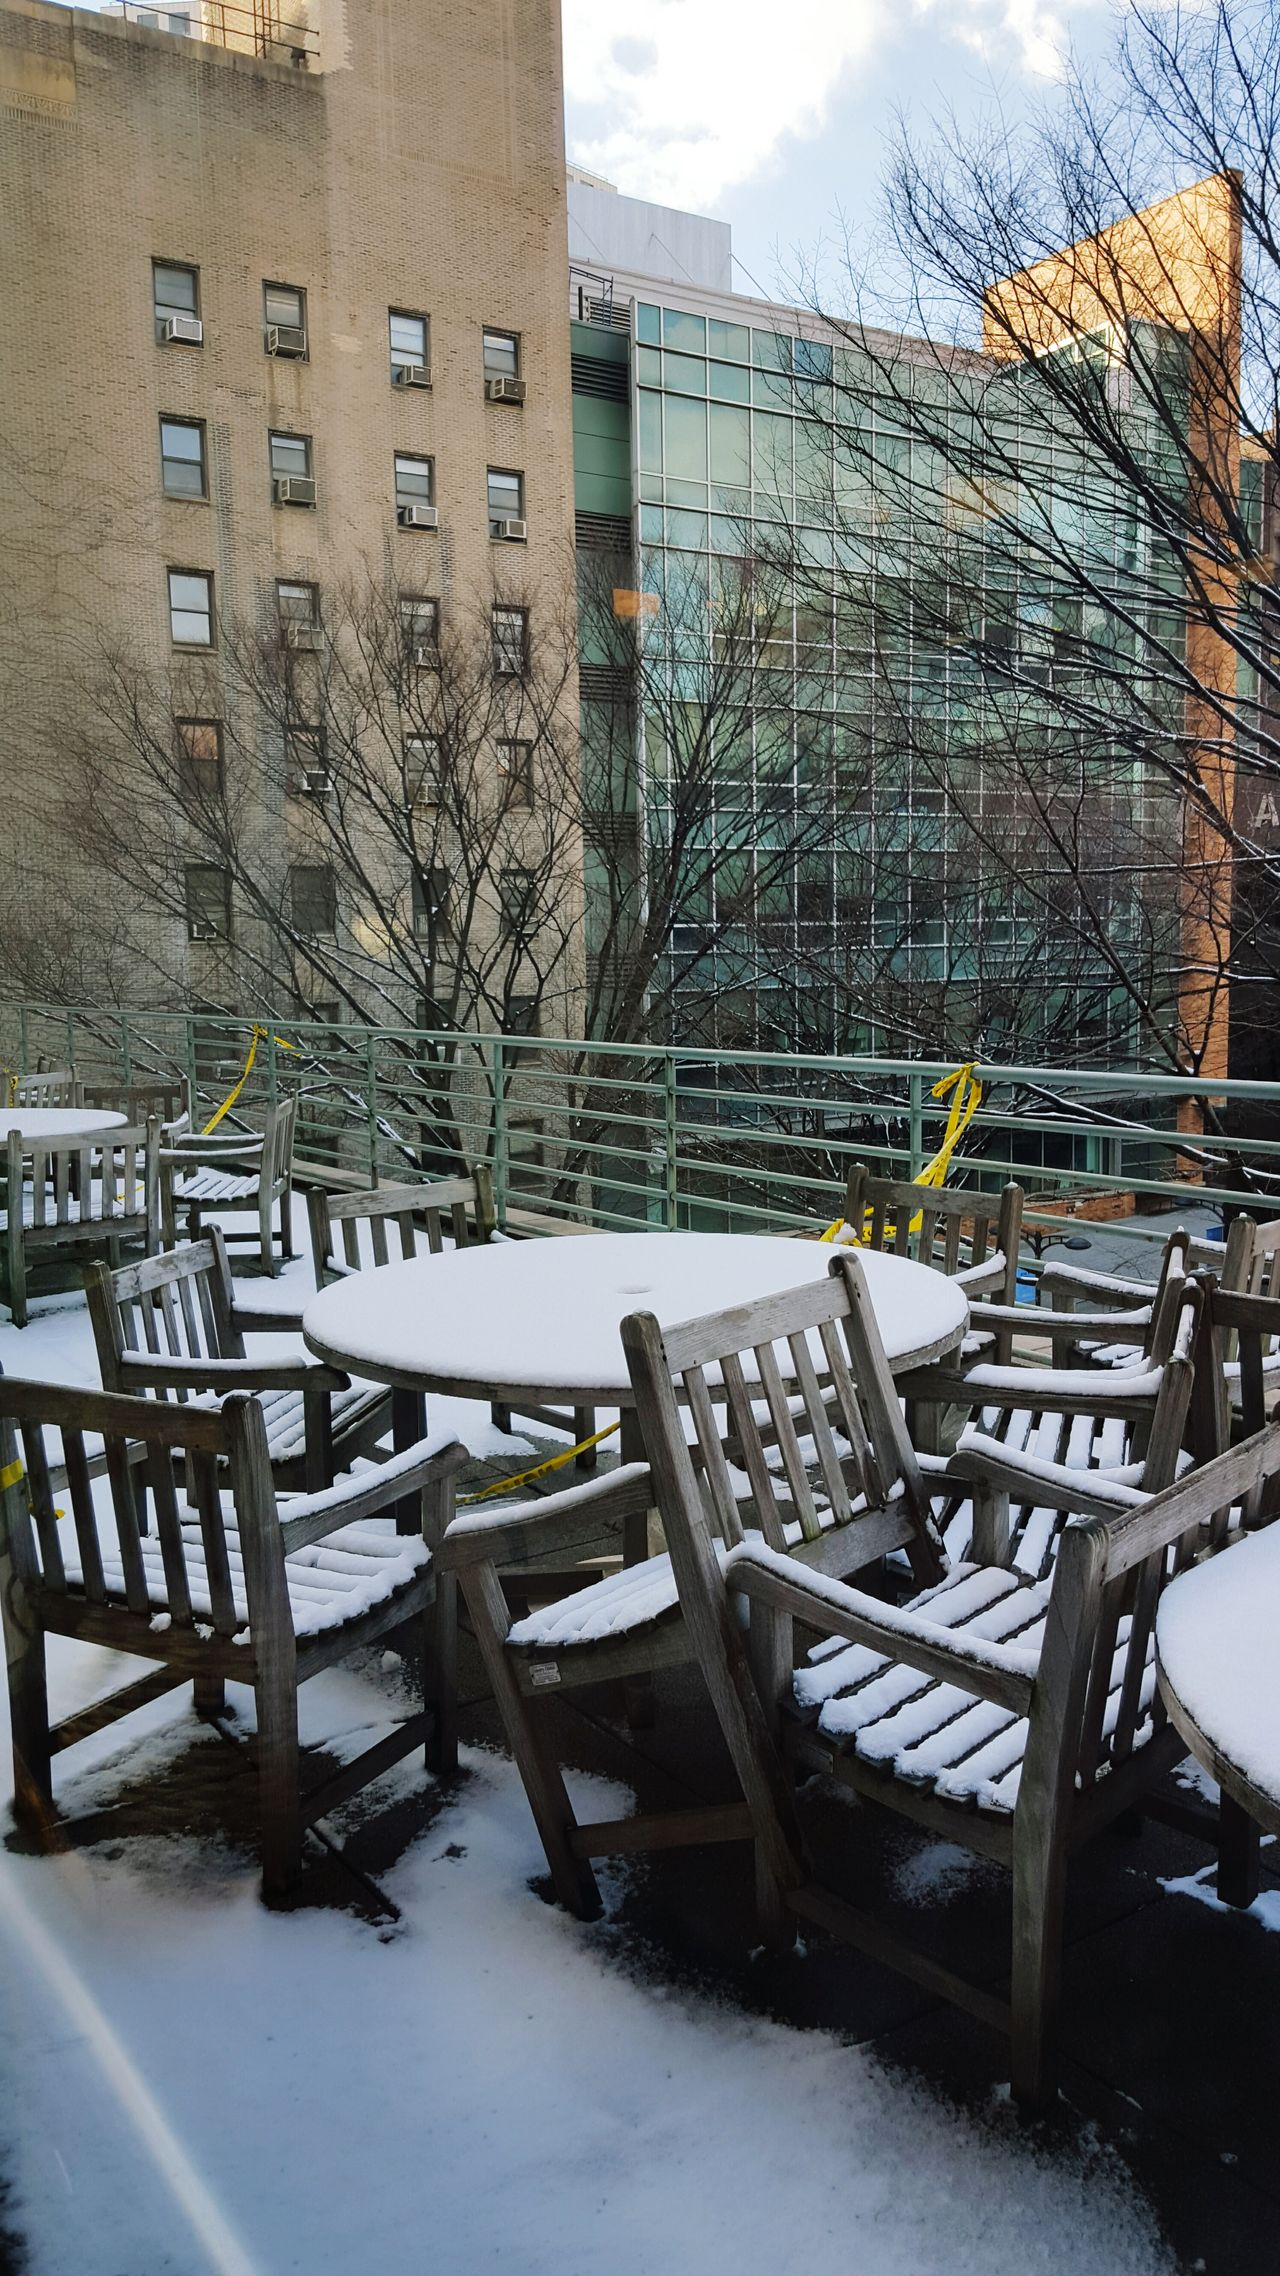 LIUBrooklyn Downtown Brooklyn Snow Table Balcony Winter